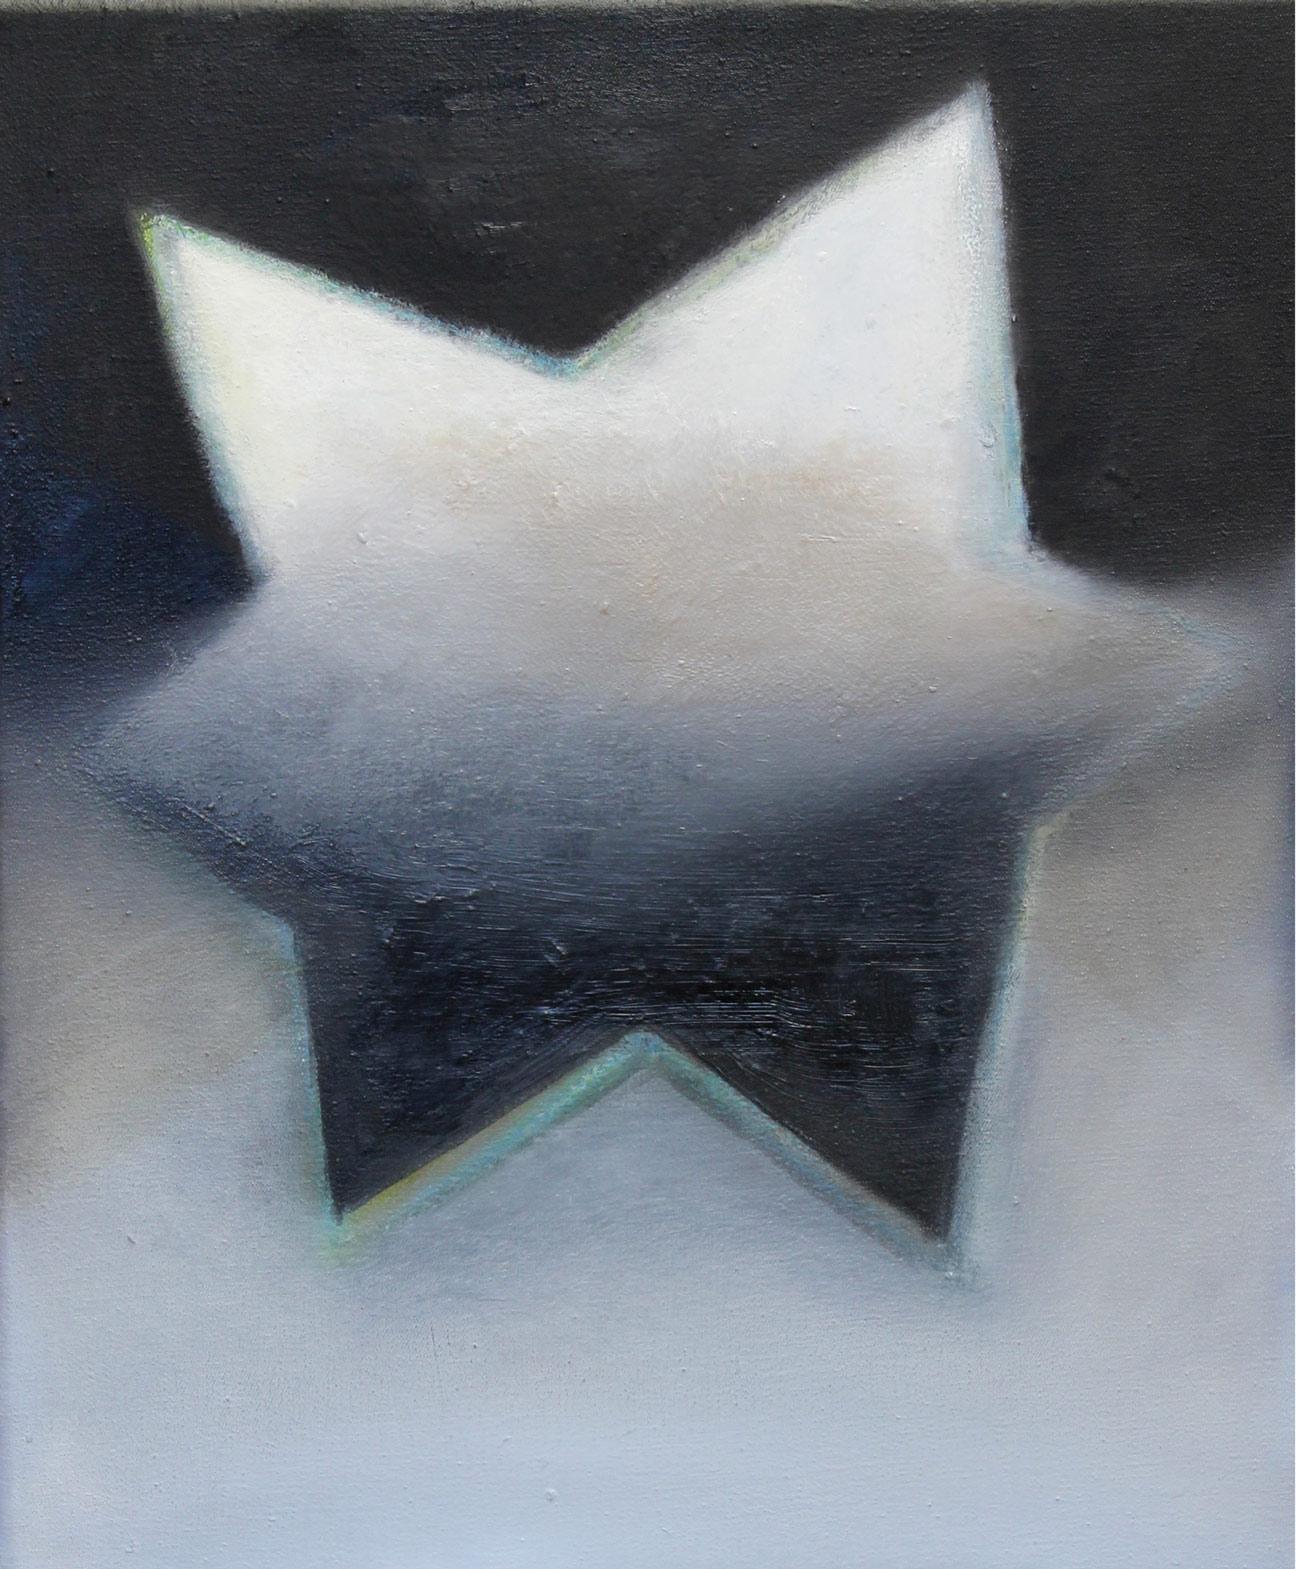 sterne-sehen-40x33-2013